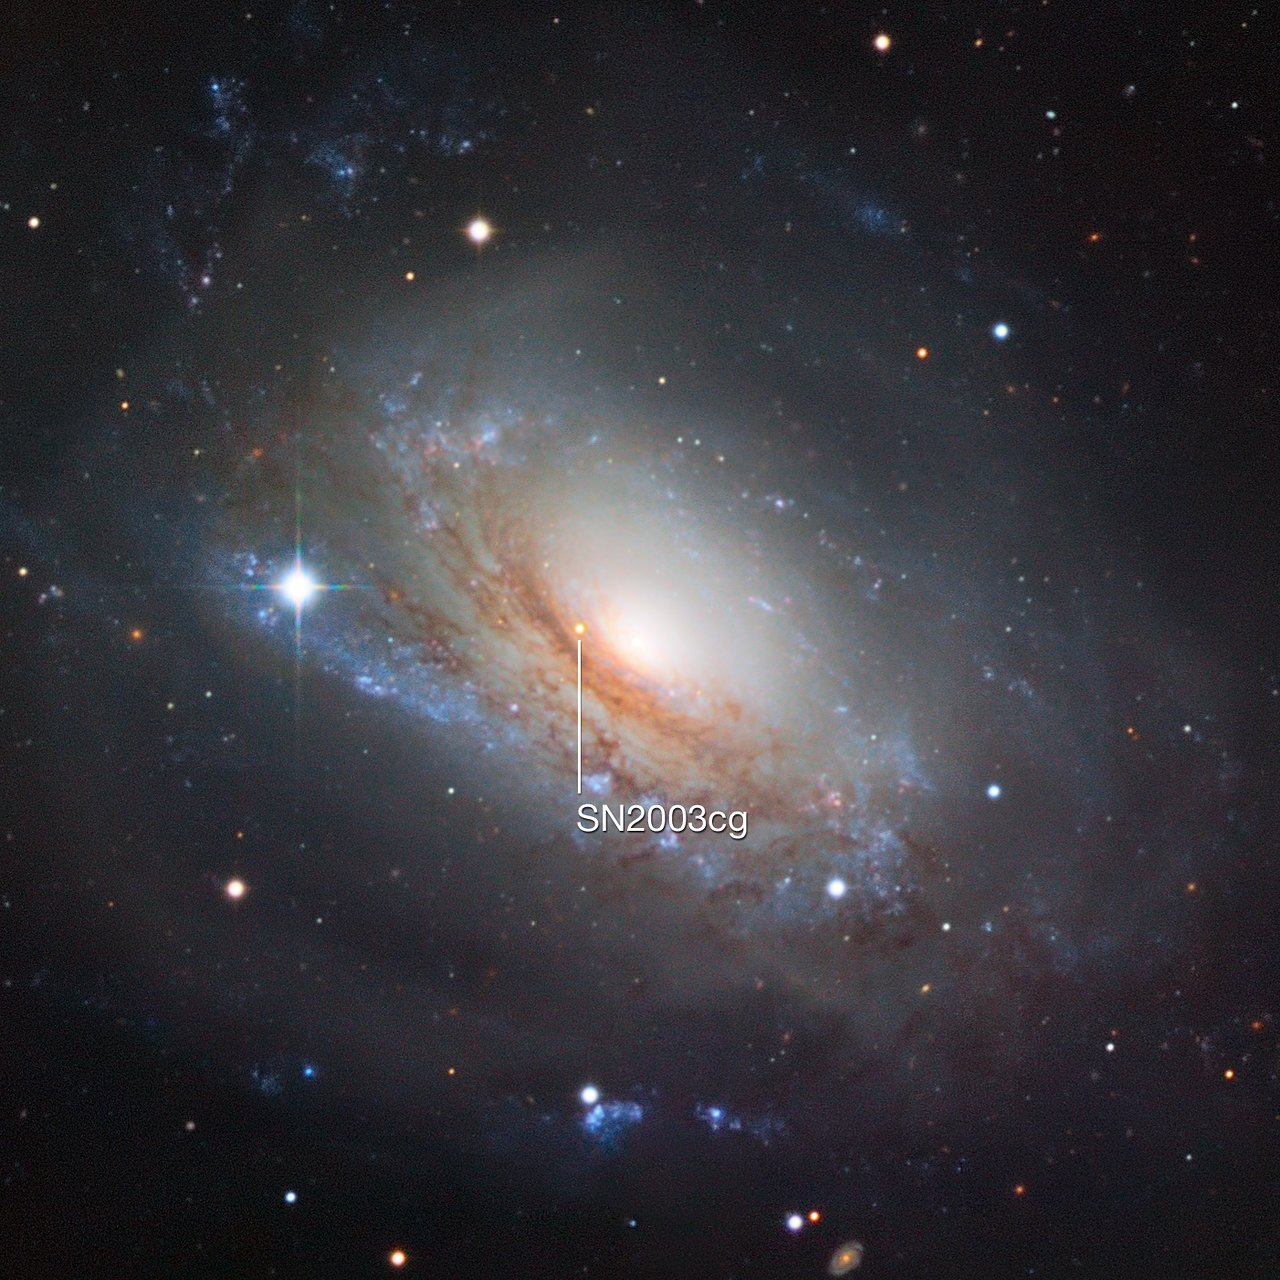 Supernova 2003cg en la galaxia NGC 3169